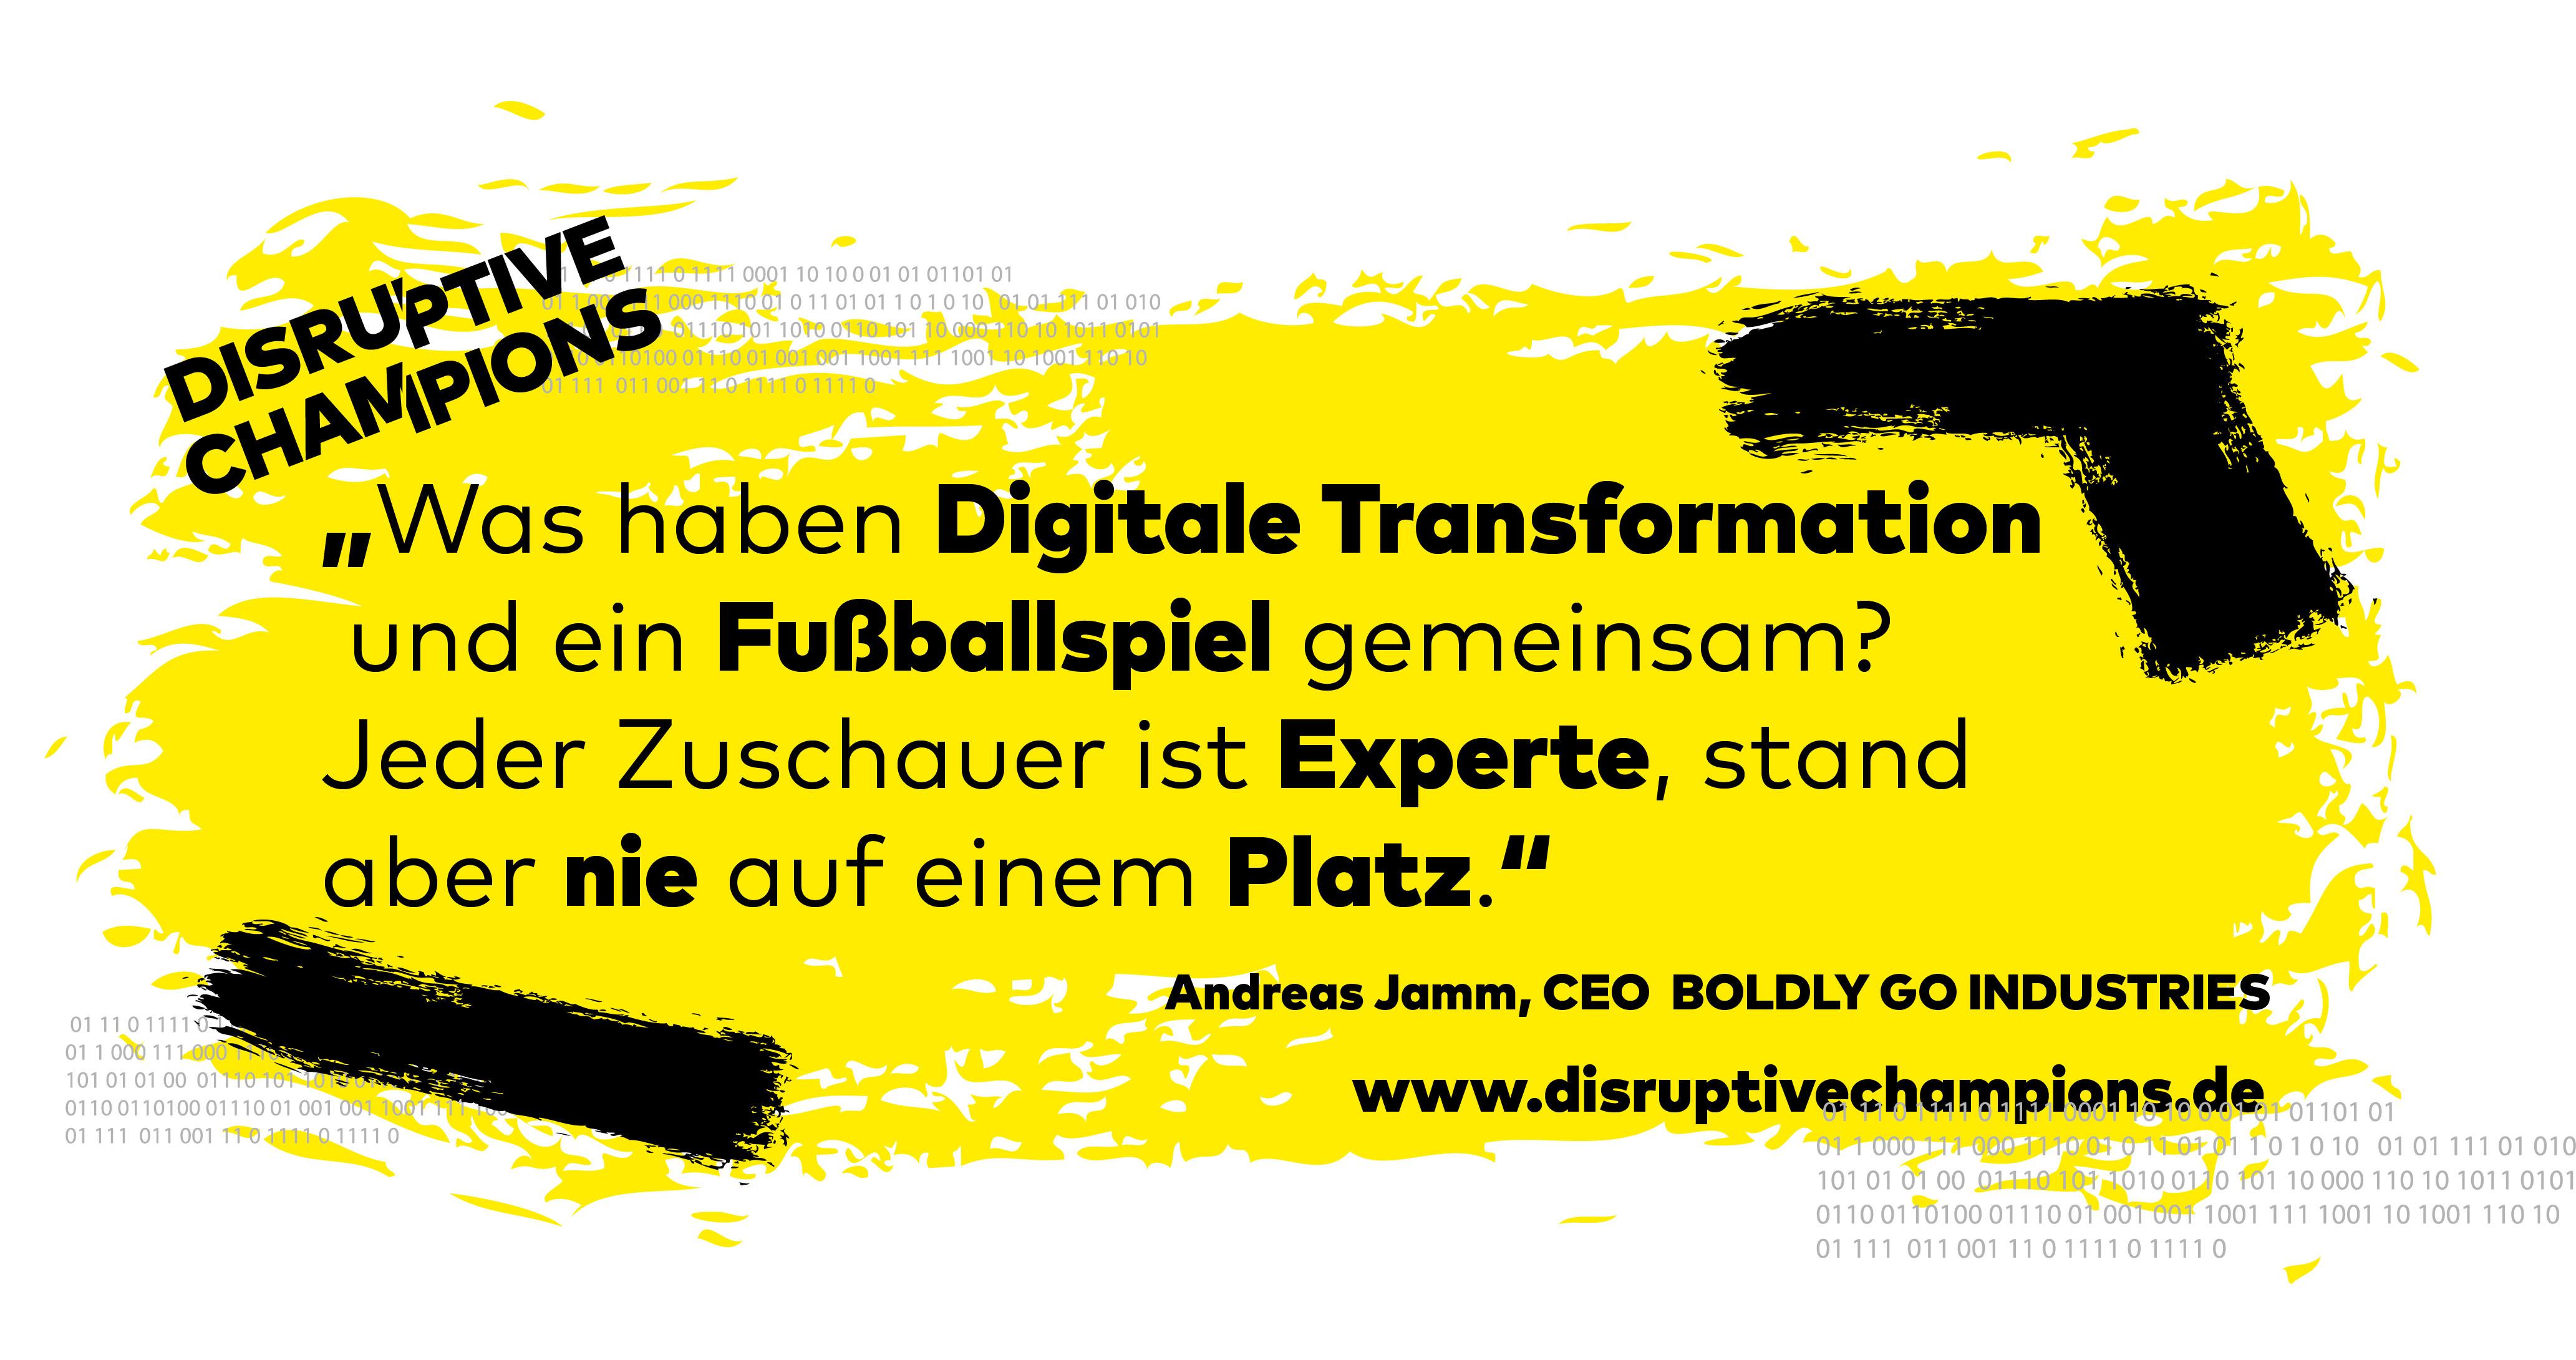 Disruptive Thought, Digitalisierung, Transformation